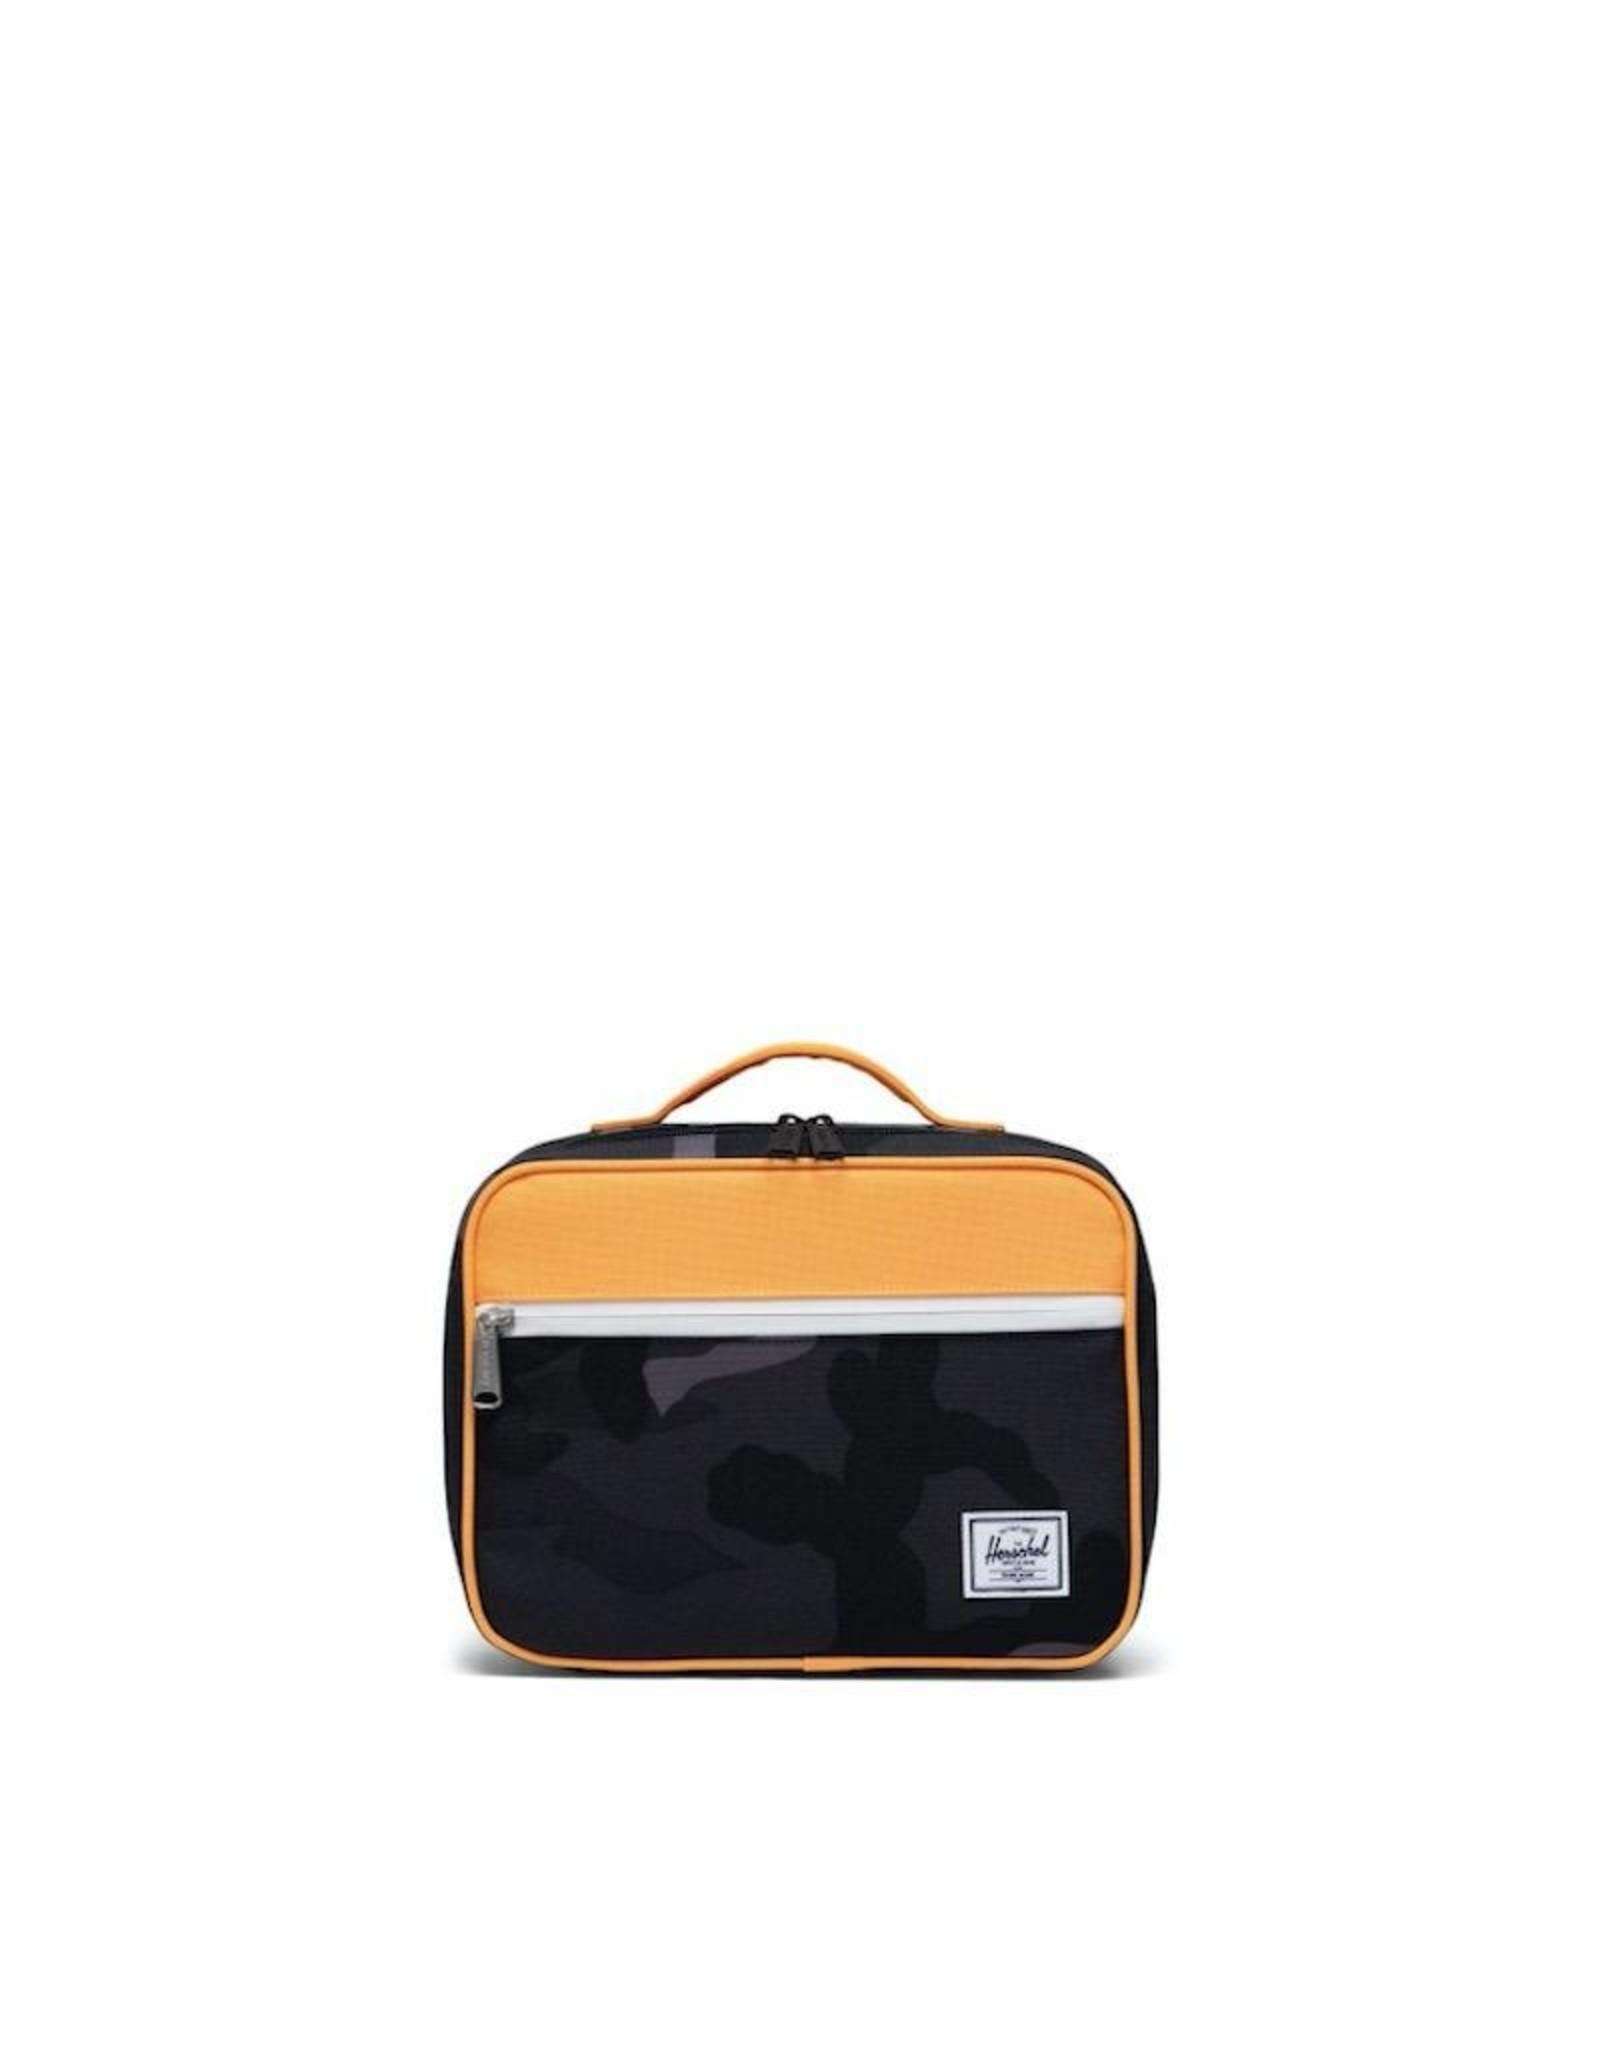 Herschel Supply Co. Popquiz Lunch Bag in Night Camo/Blazing Orange, 5L